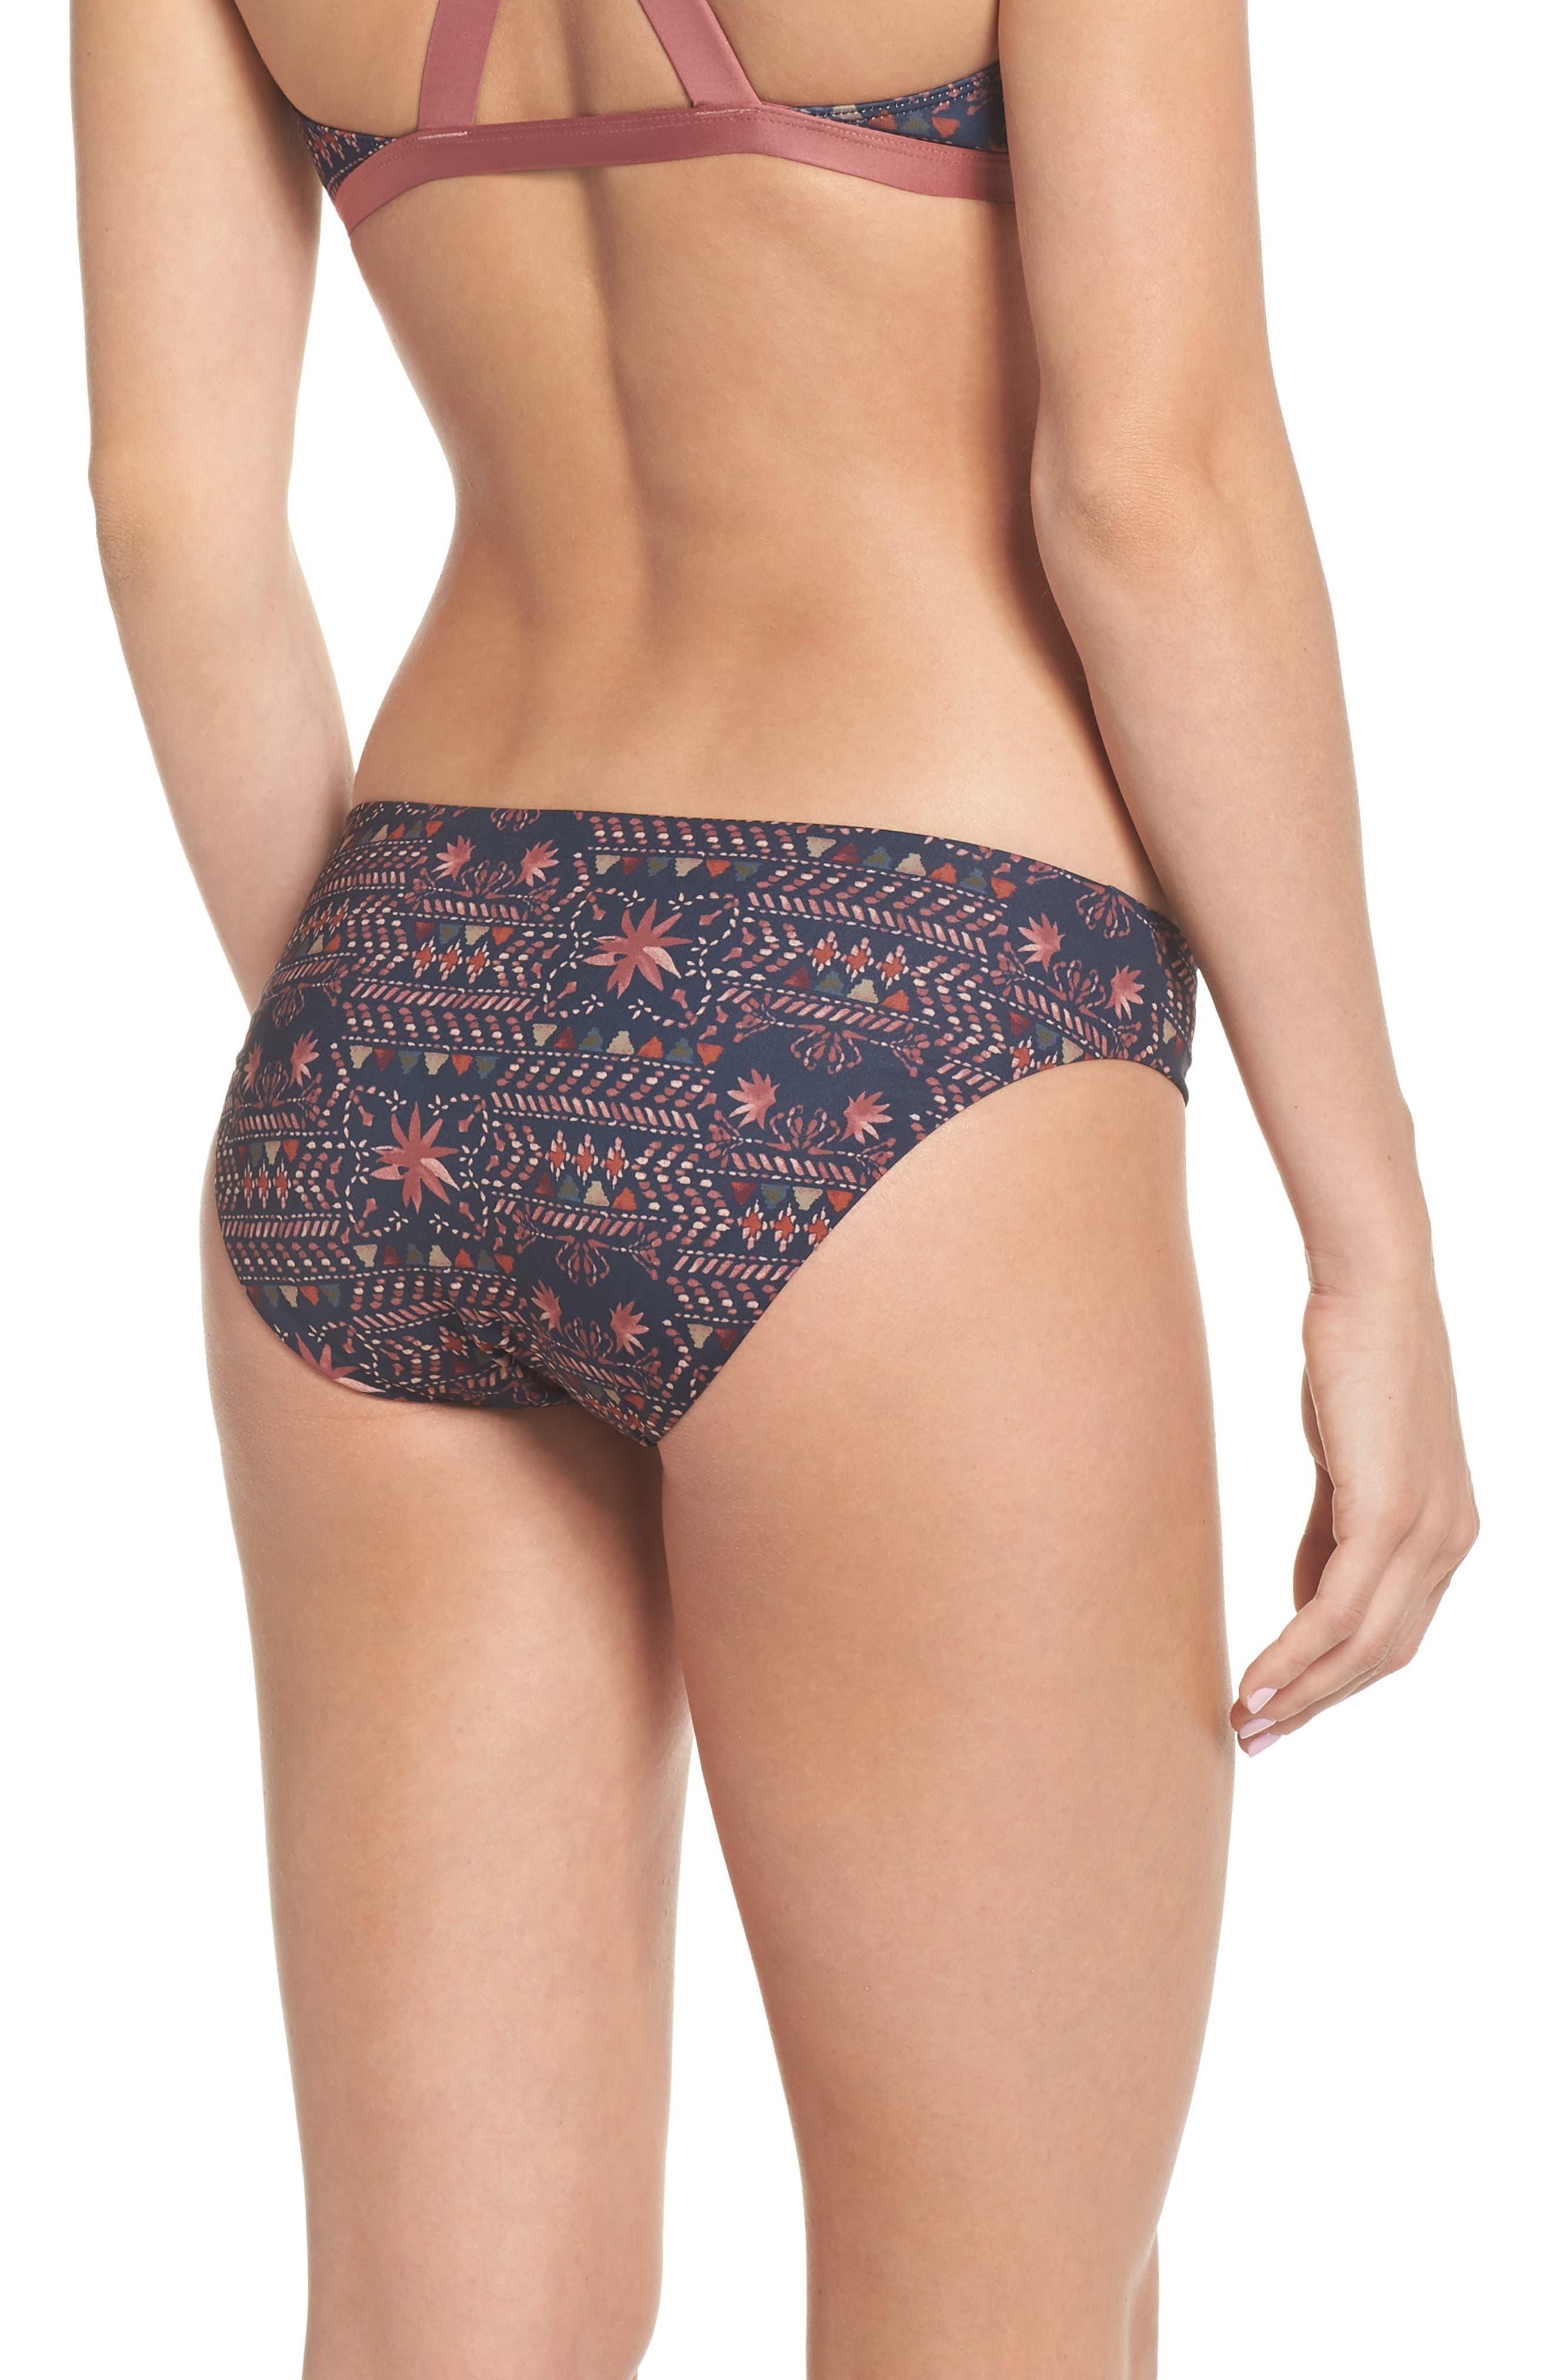 Sunamee Bikini Bottoms,                             Alternate thumbnail 2, color,                             FIRESIDE: NAVY BLUE